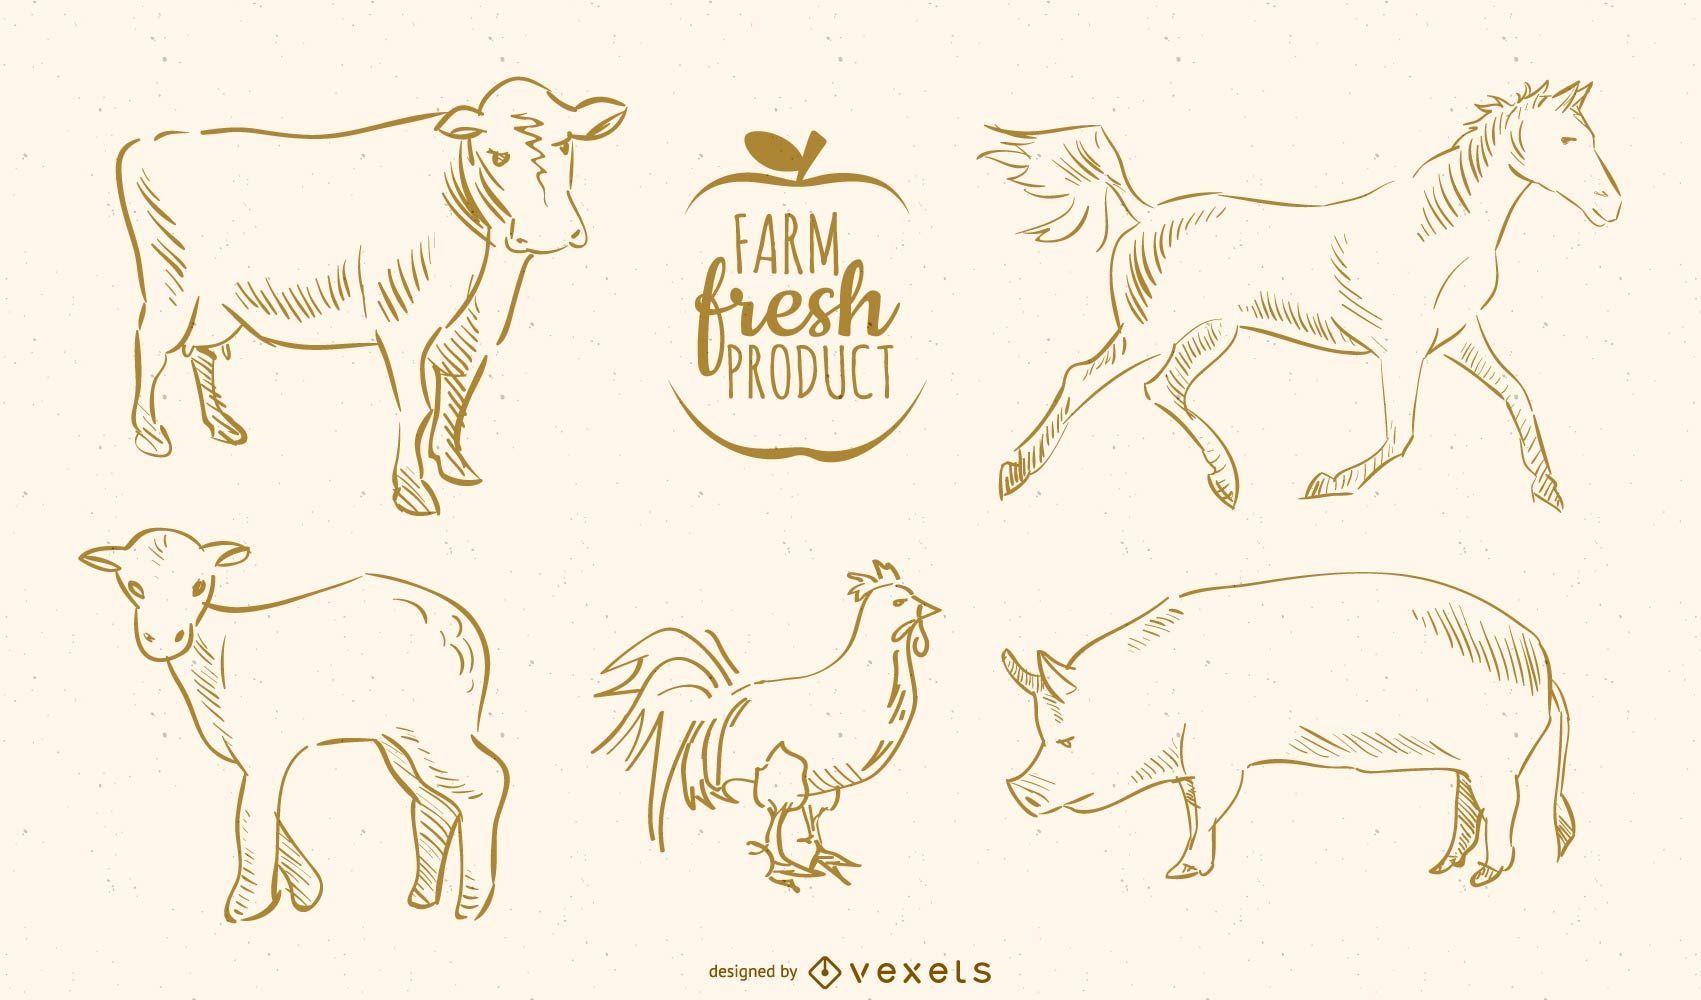 Animales de granja dibujados a mano